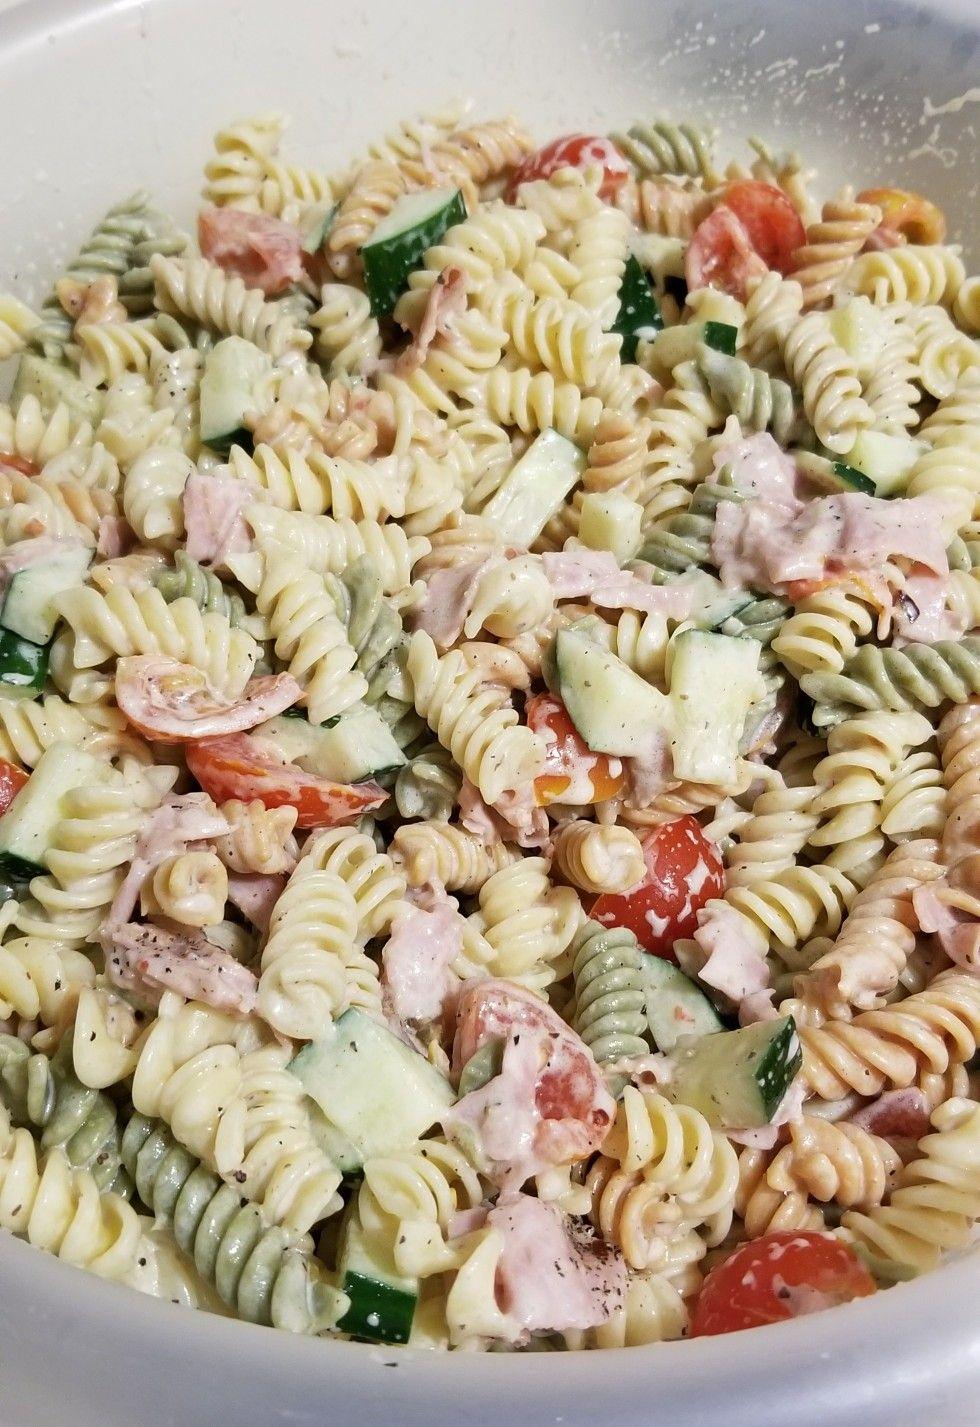 Pasta Salad Pasta Tomatoes Cucumbers Ham Pepper And Ranch Italian Dressing Pasta Salad Pasta Salad Recipes Easy Pasta Salad Recipe